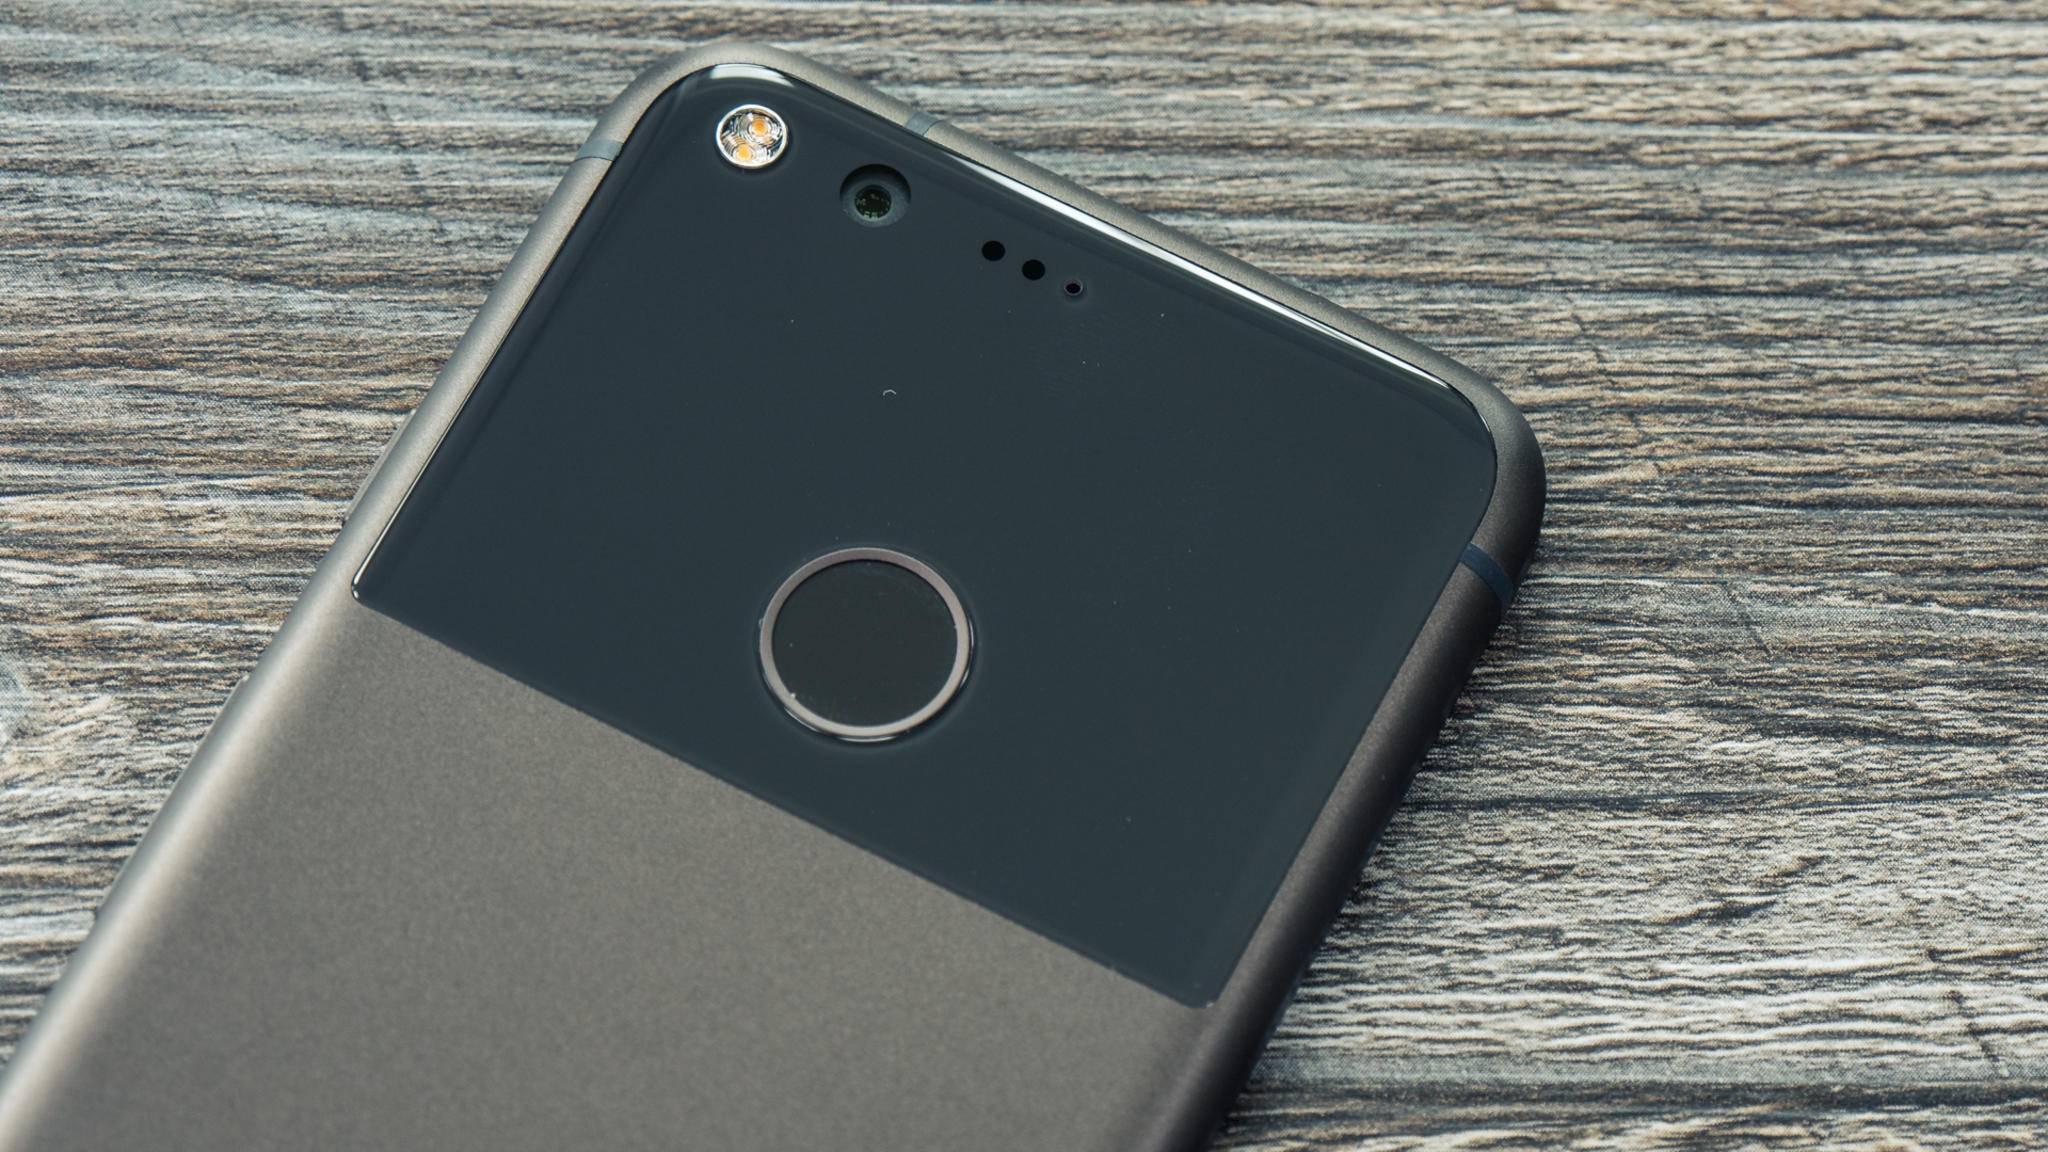 Die Kamera des ersten Pixel bekommt auch Google-Lens-Features.